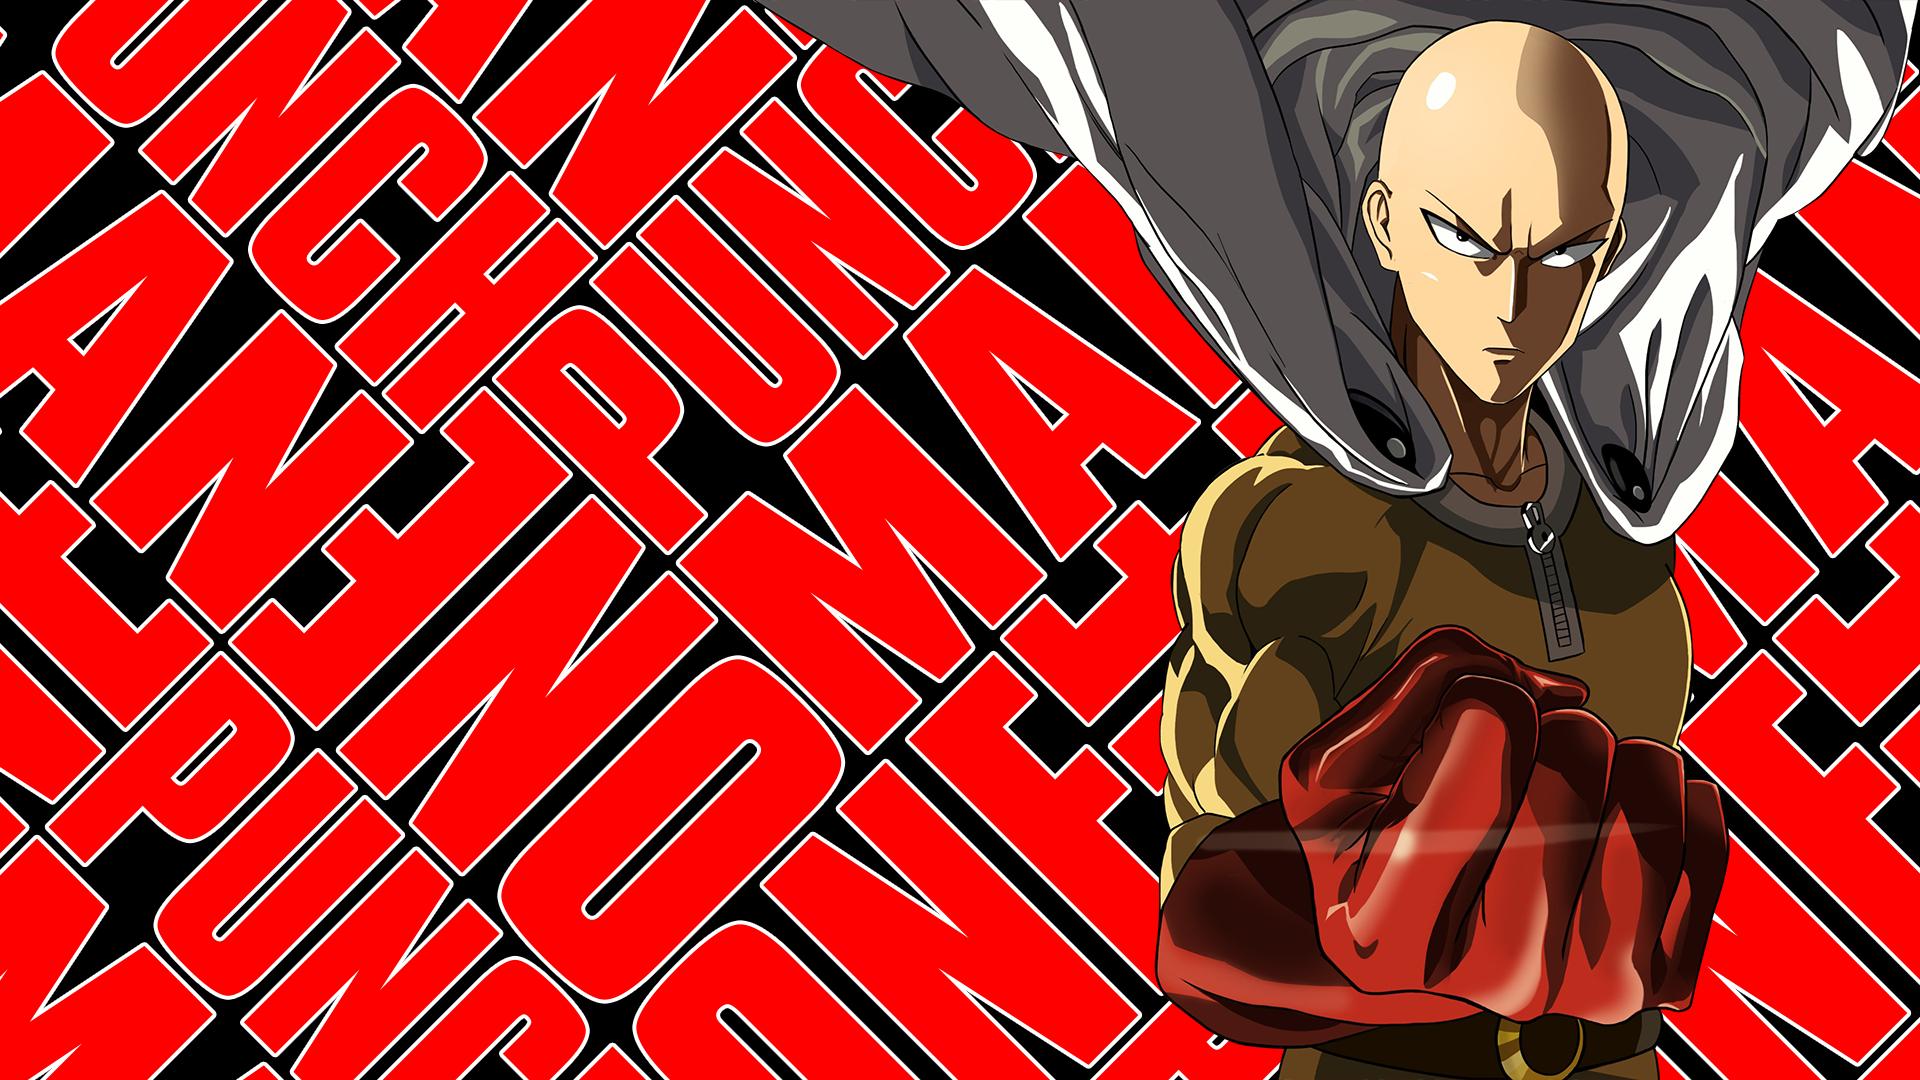 Anime 1920x1080 One-Punch Man Saitama artwork anime anime boys